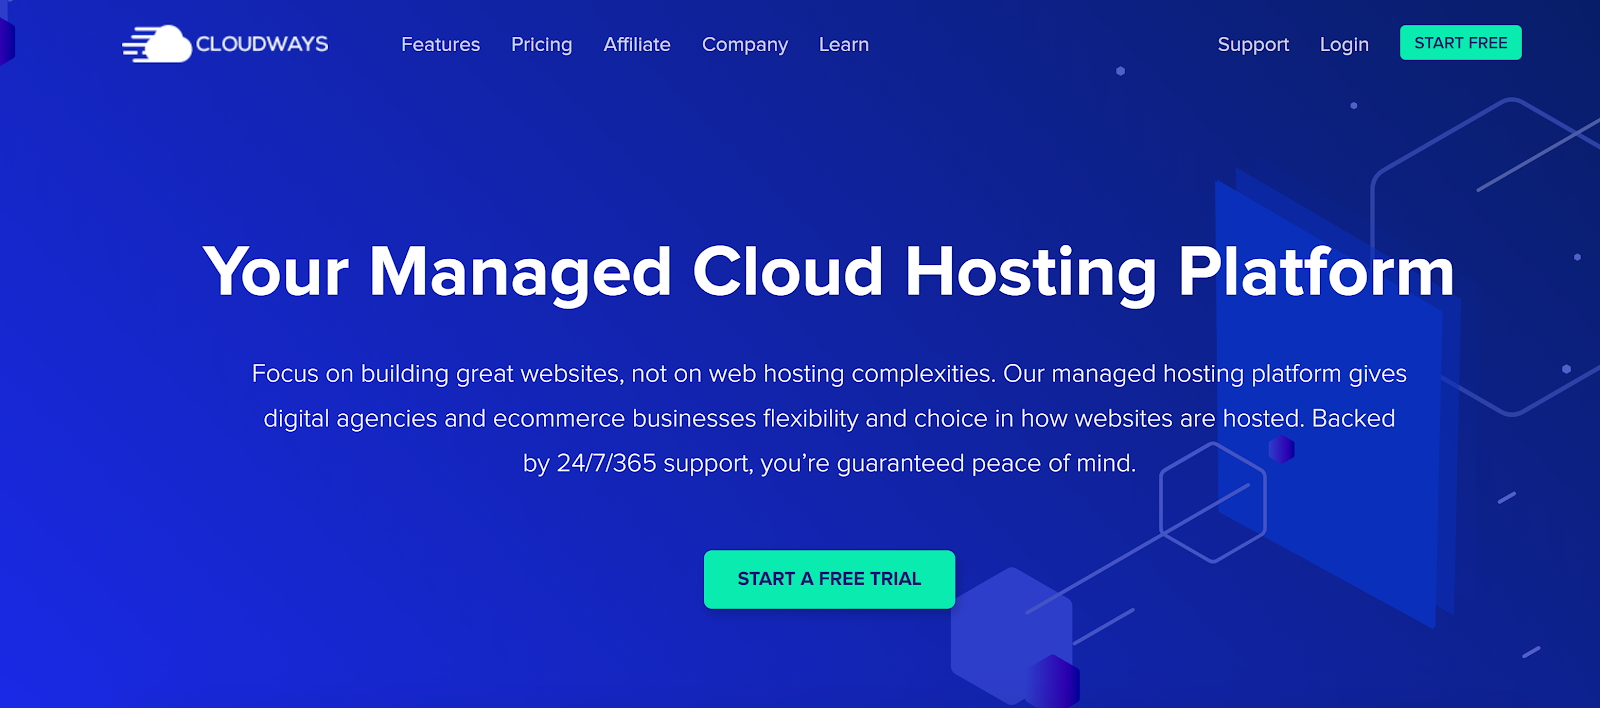 Cloudways' website